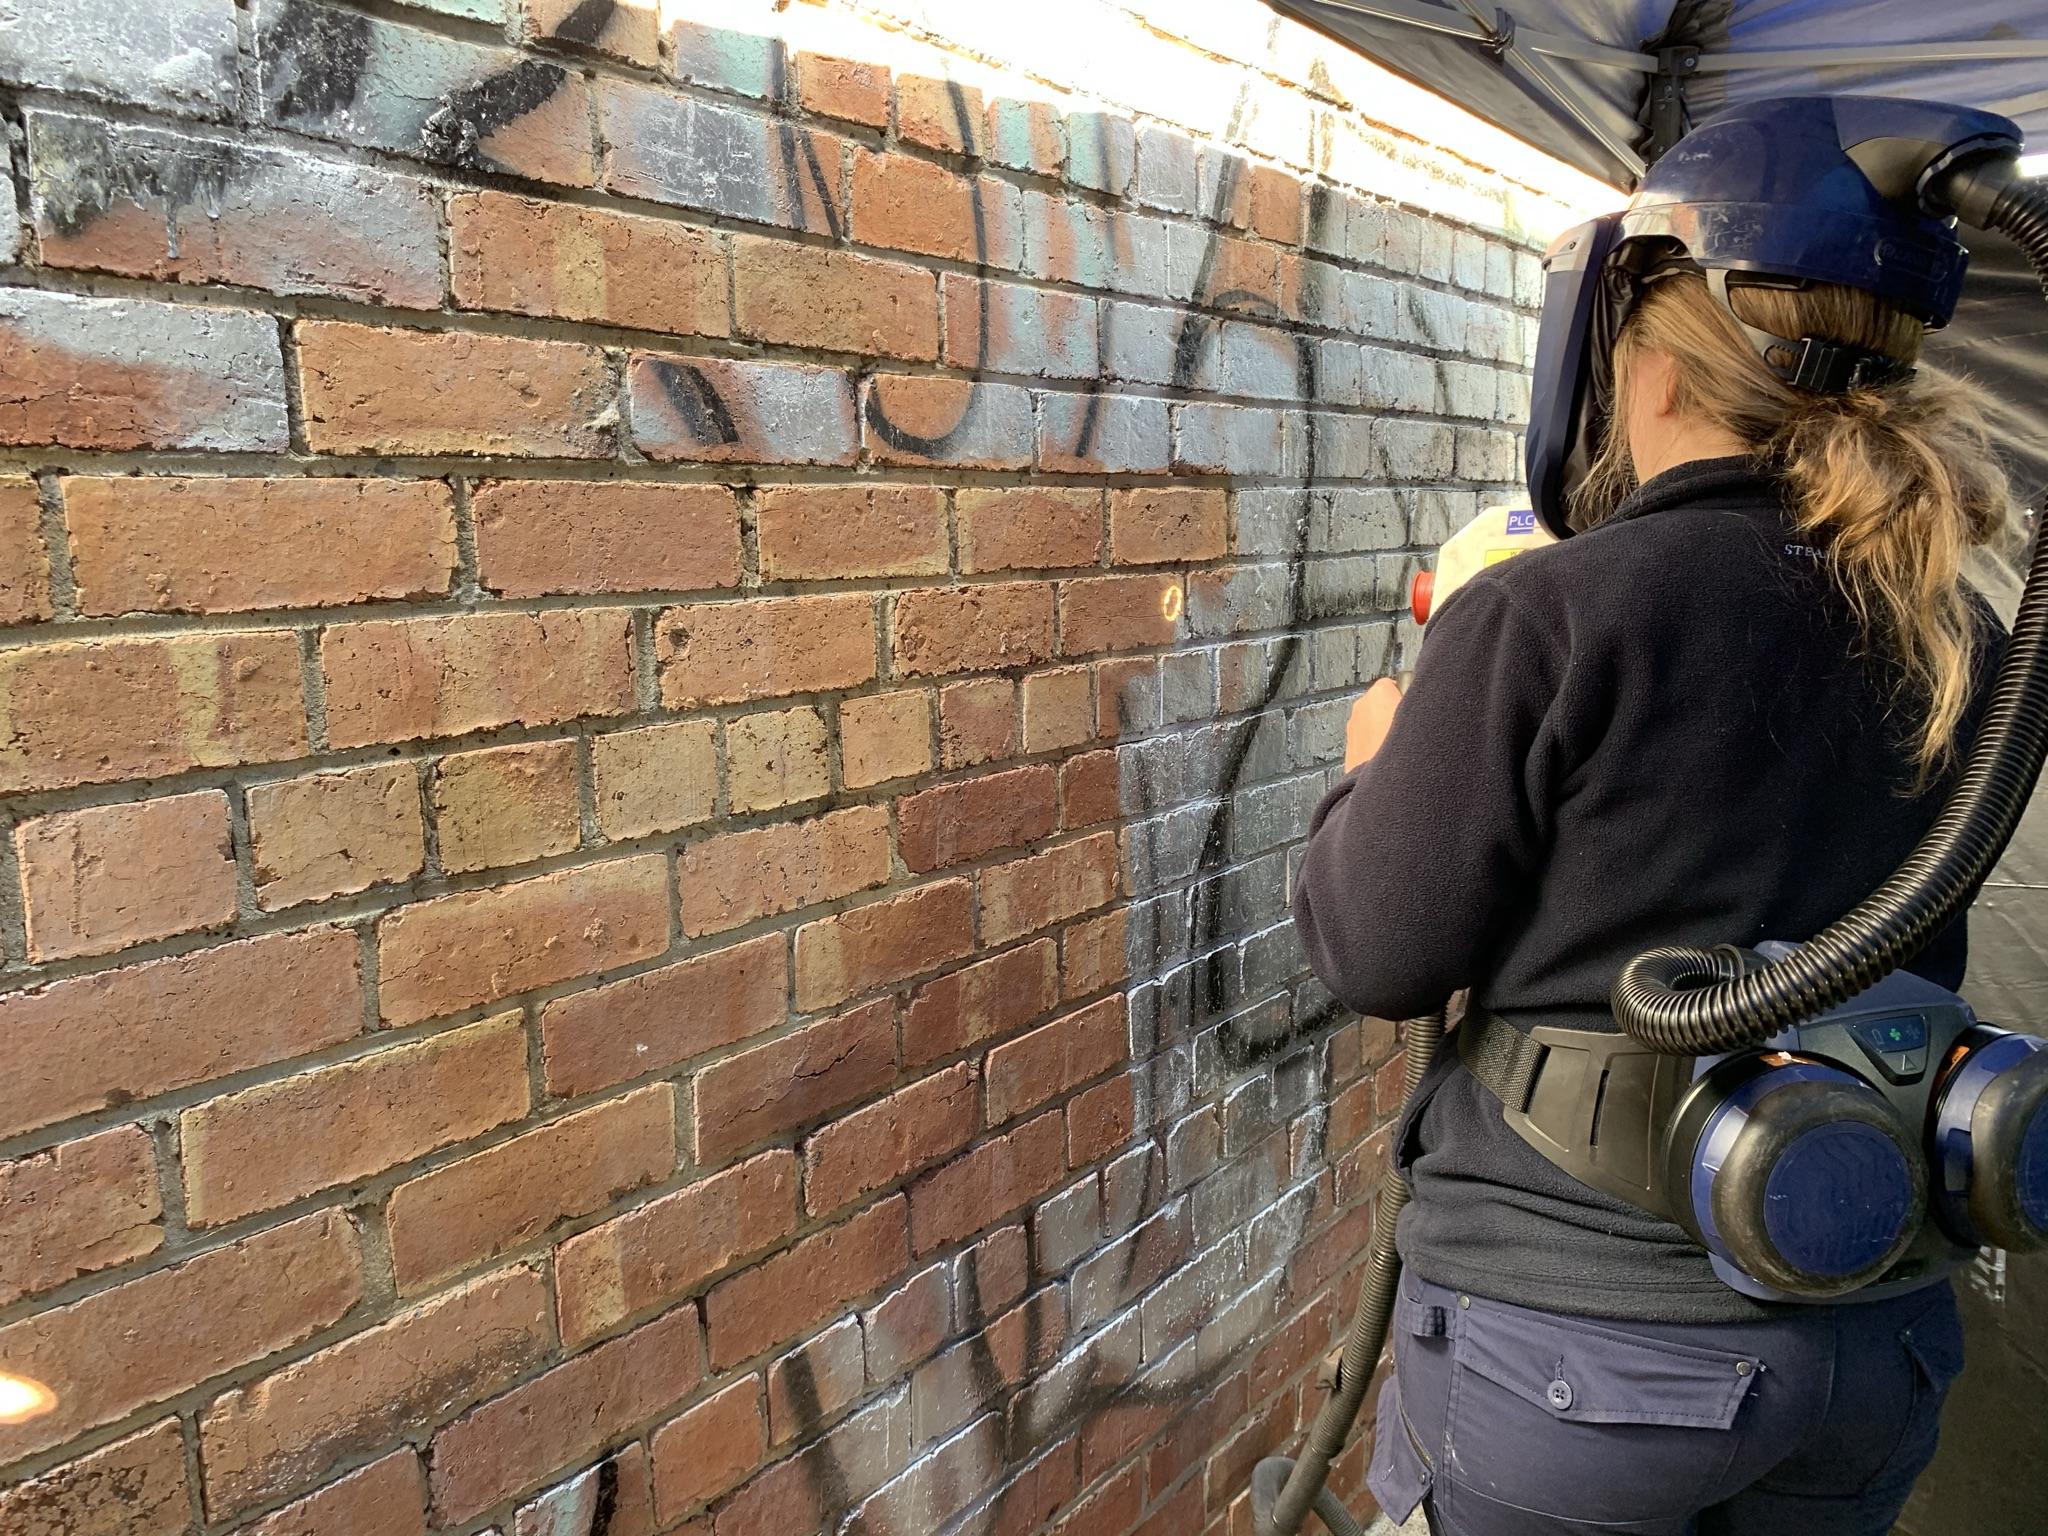 non-abrasive graffiti removal method